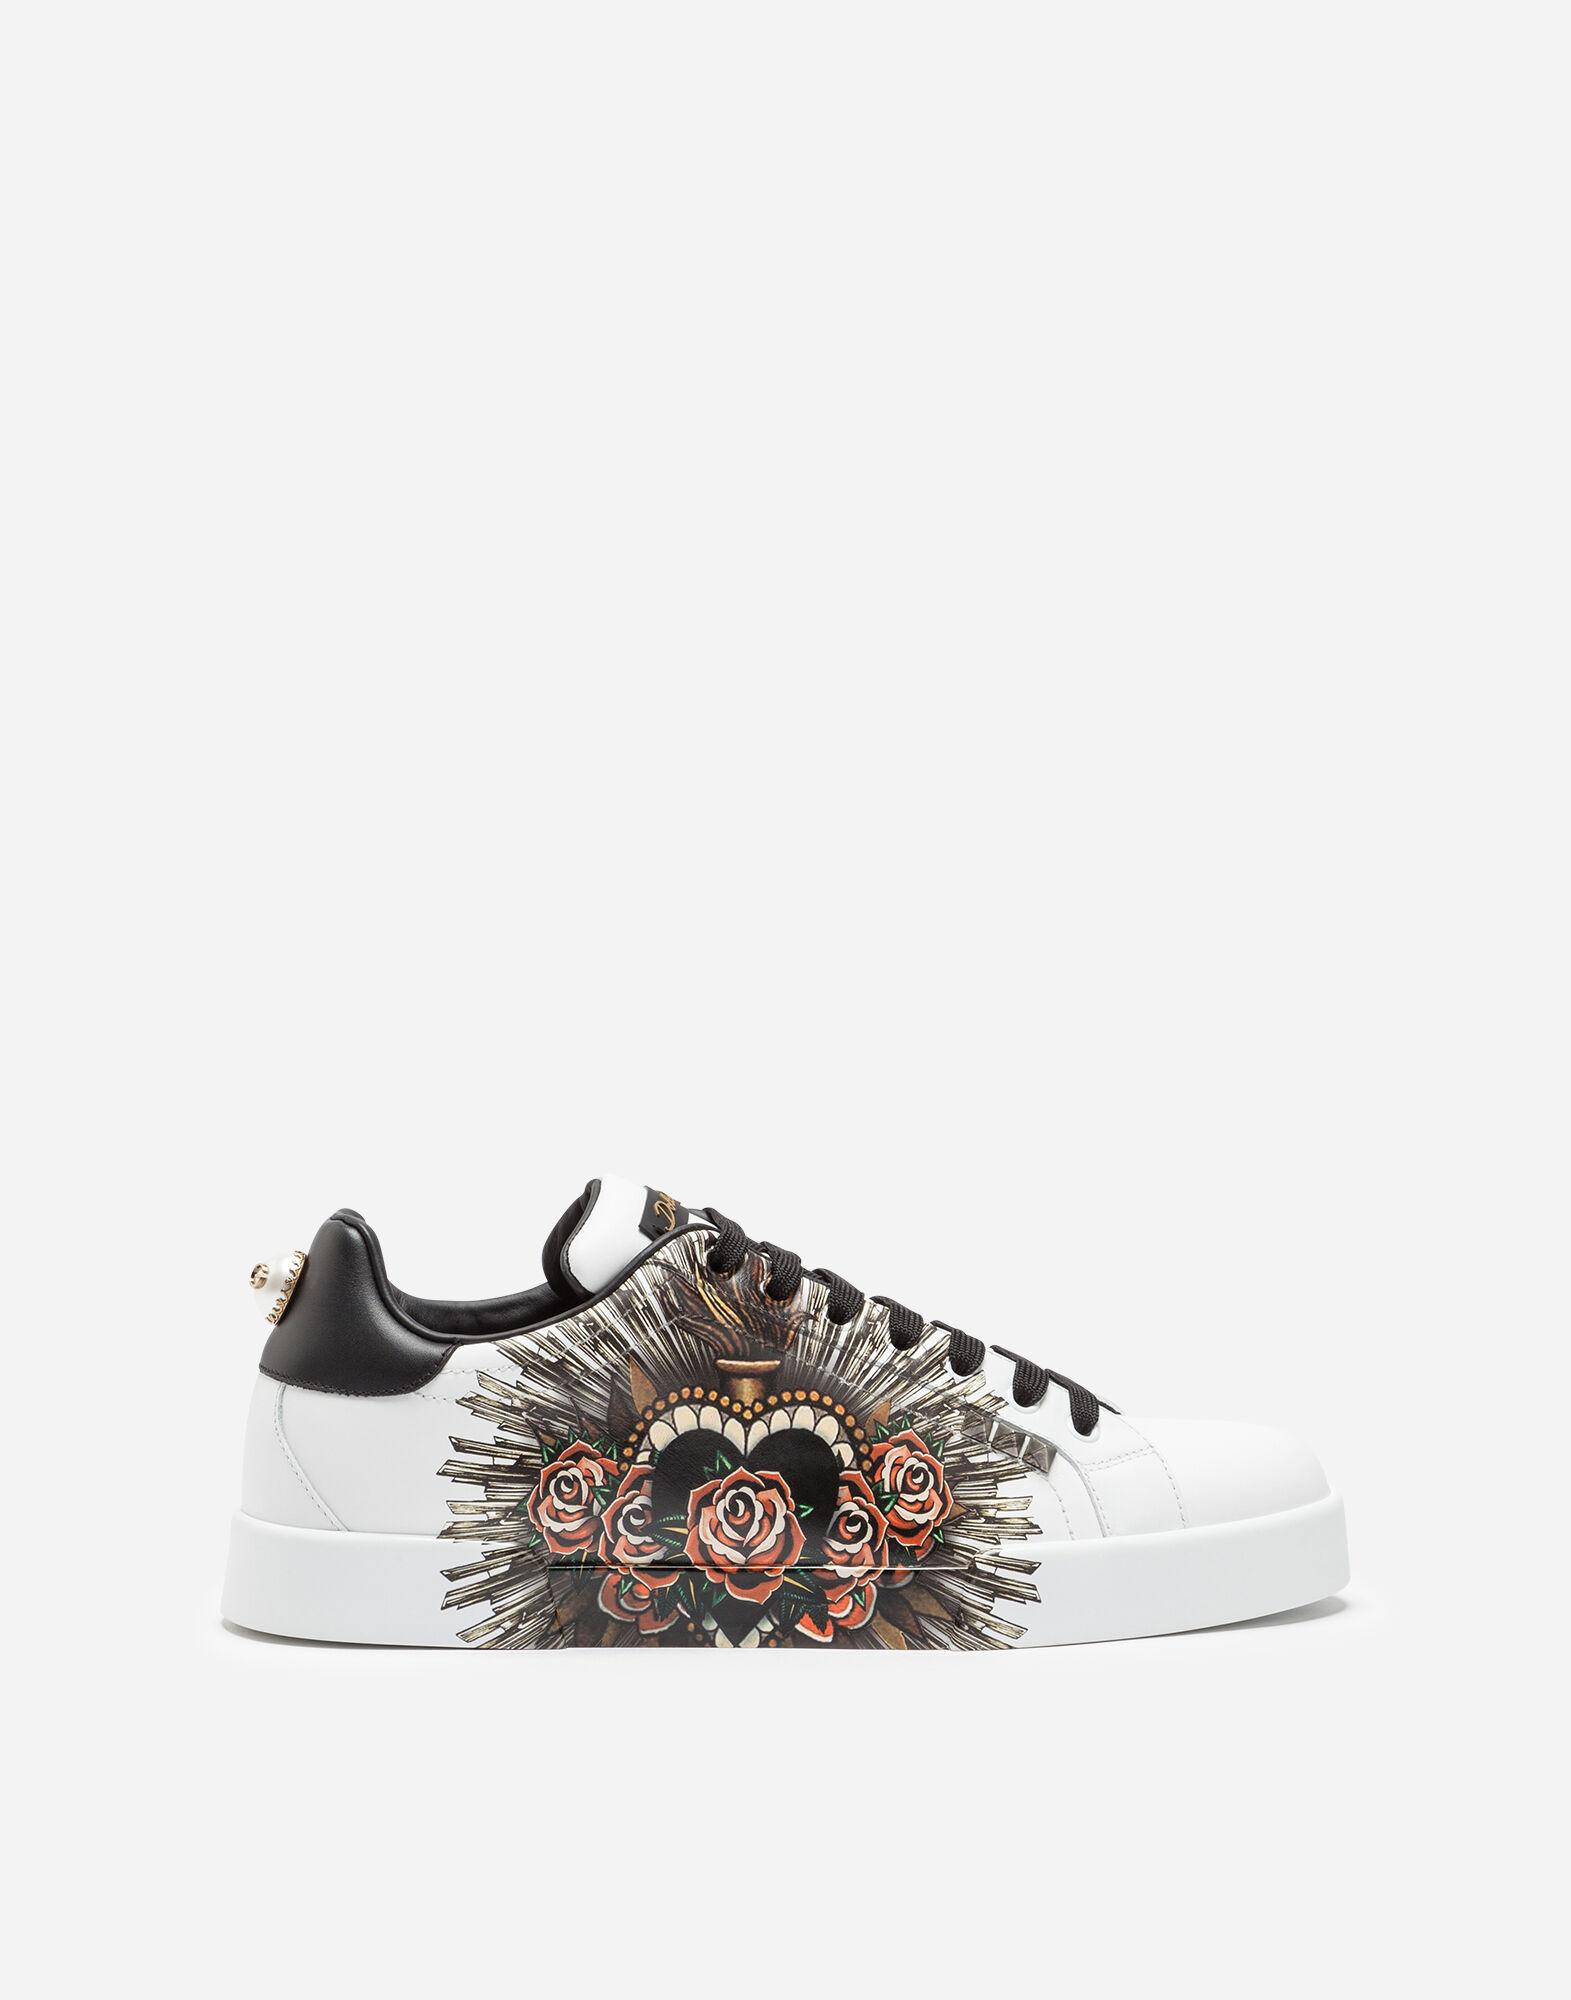 Dolce In Calfskin amp;gabbana Men Printed Sneakers Portofino w4xq1Xv8q